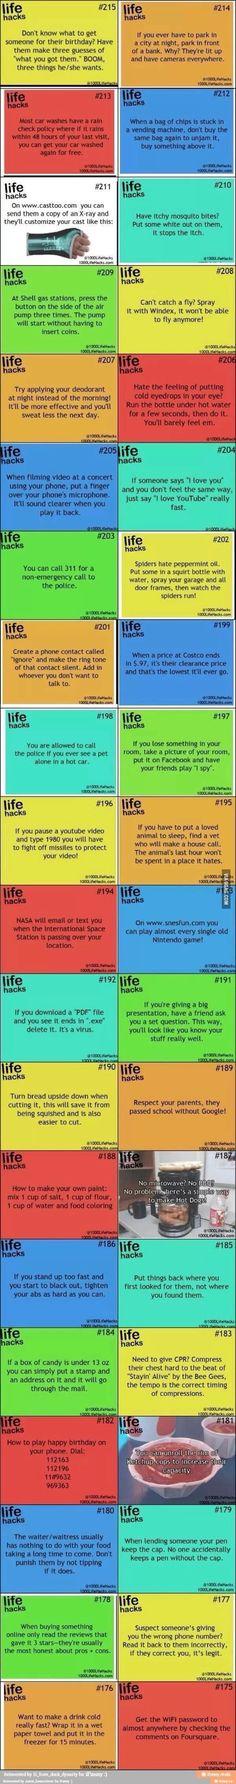 Lots of Life Hacks